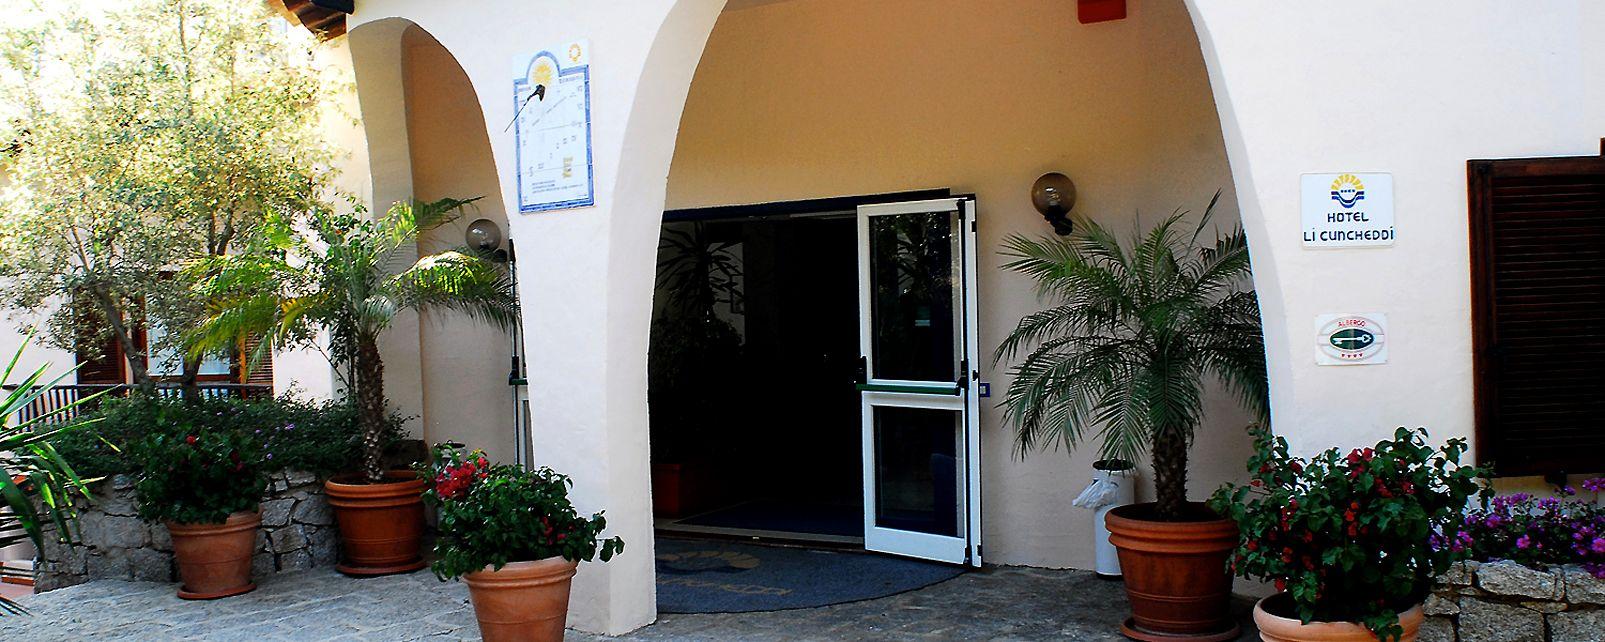 Hôtel Li Cuncheddi